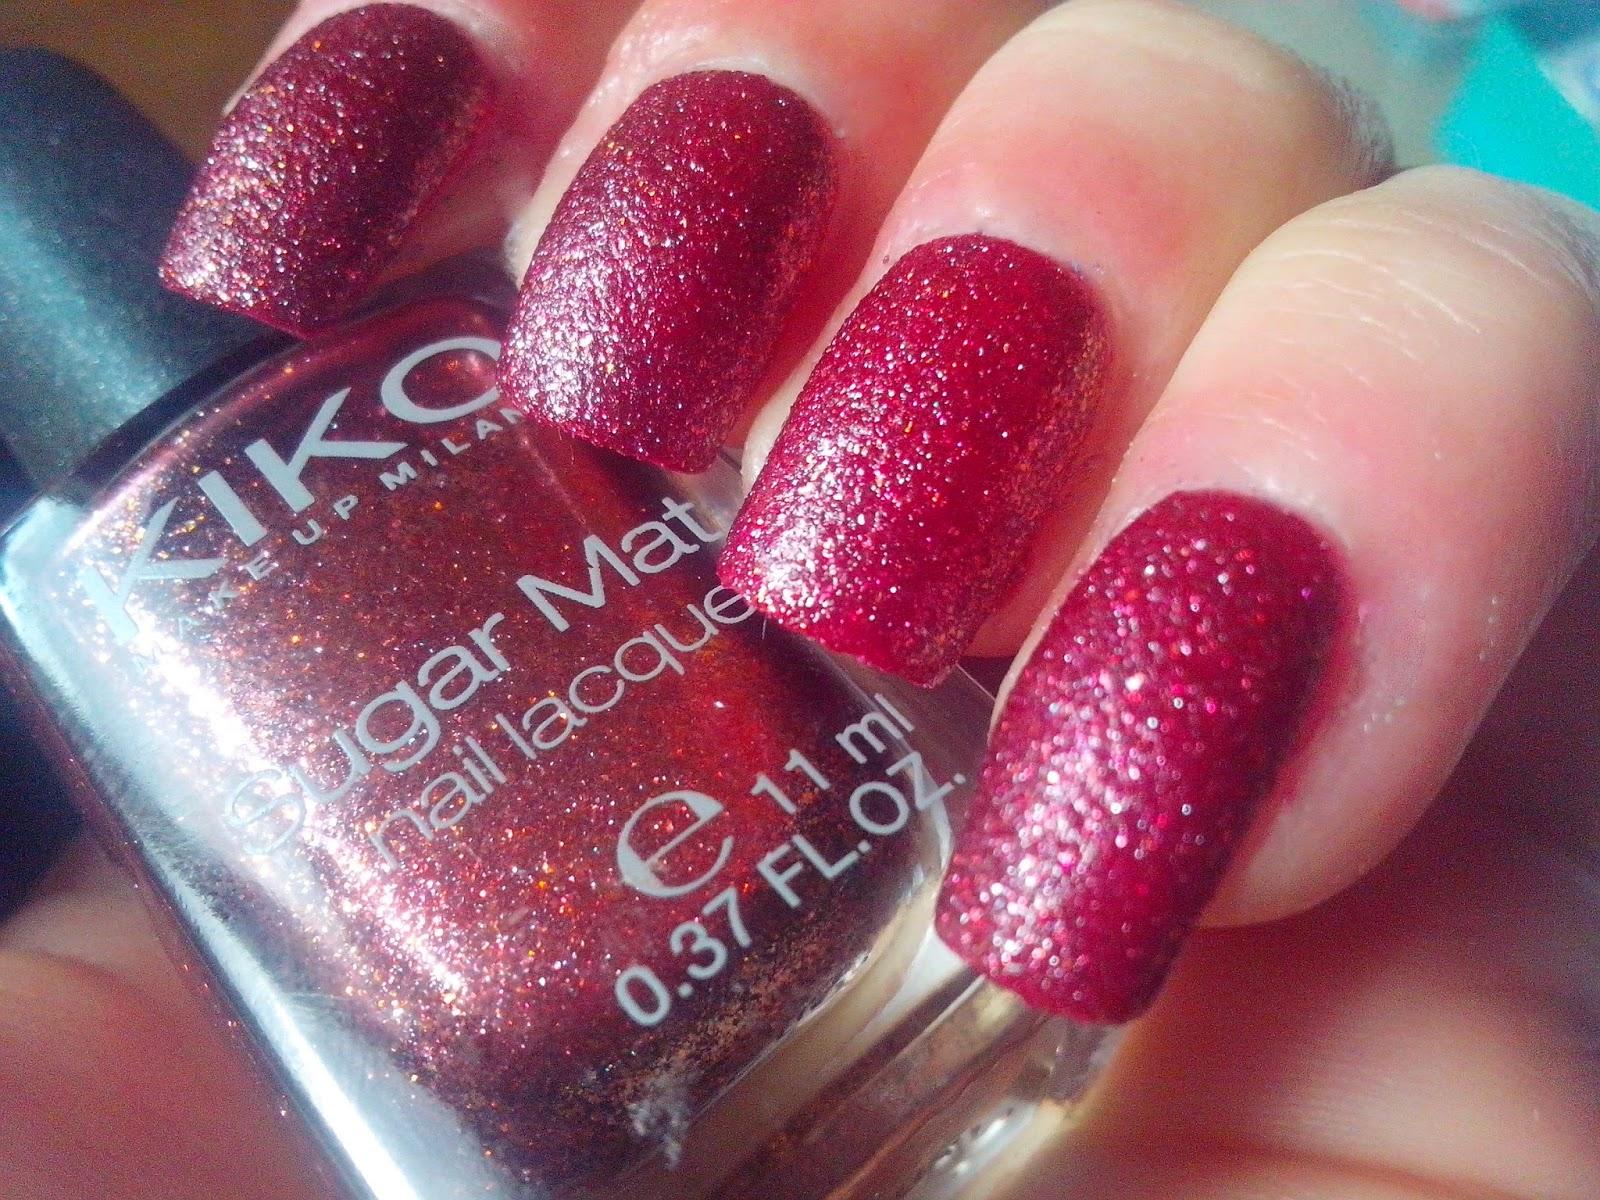 Kiko-645